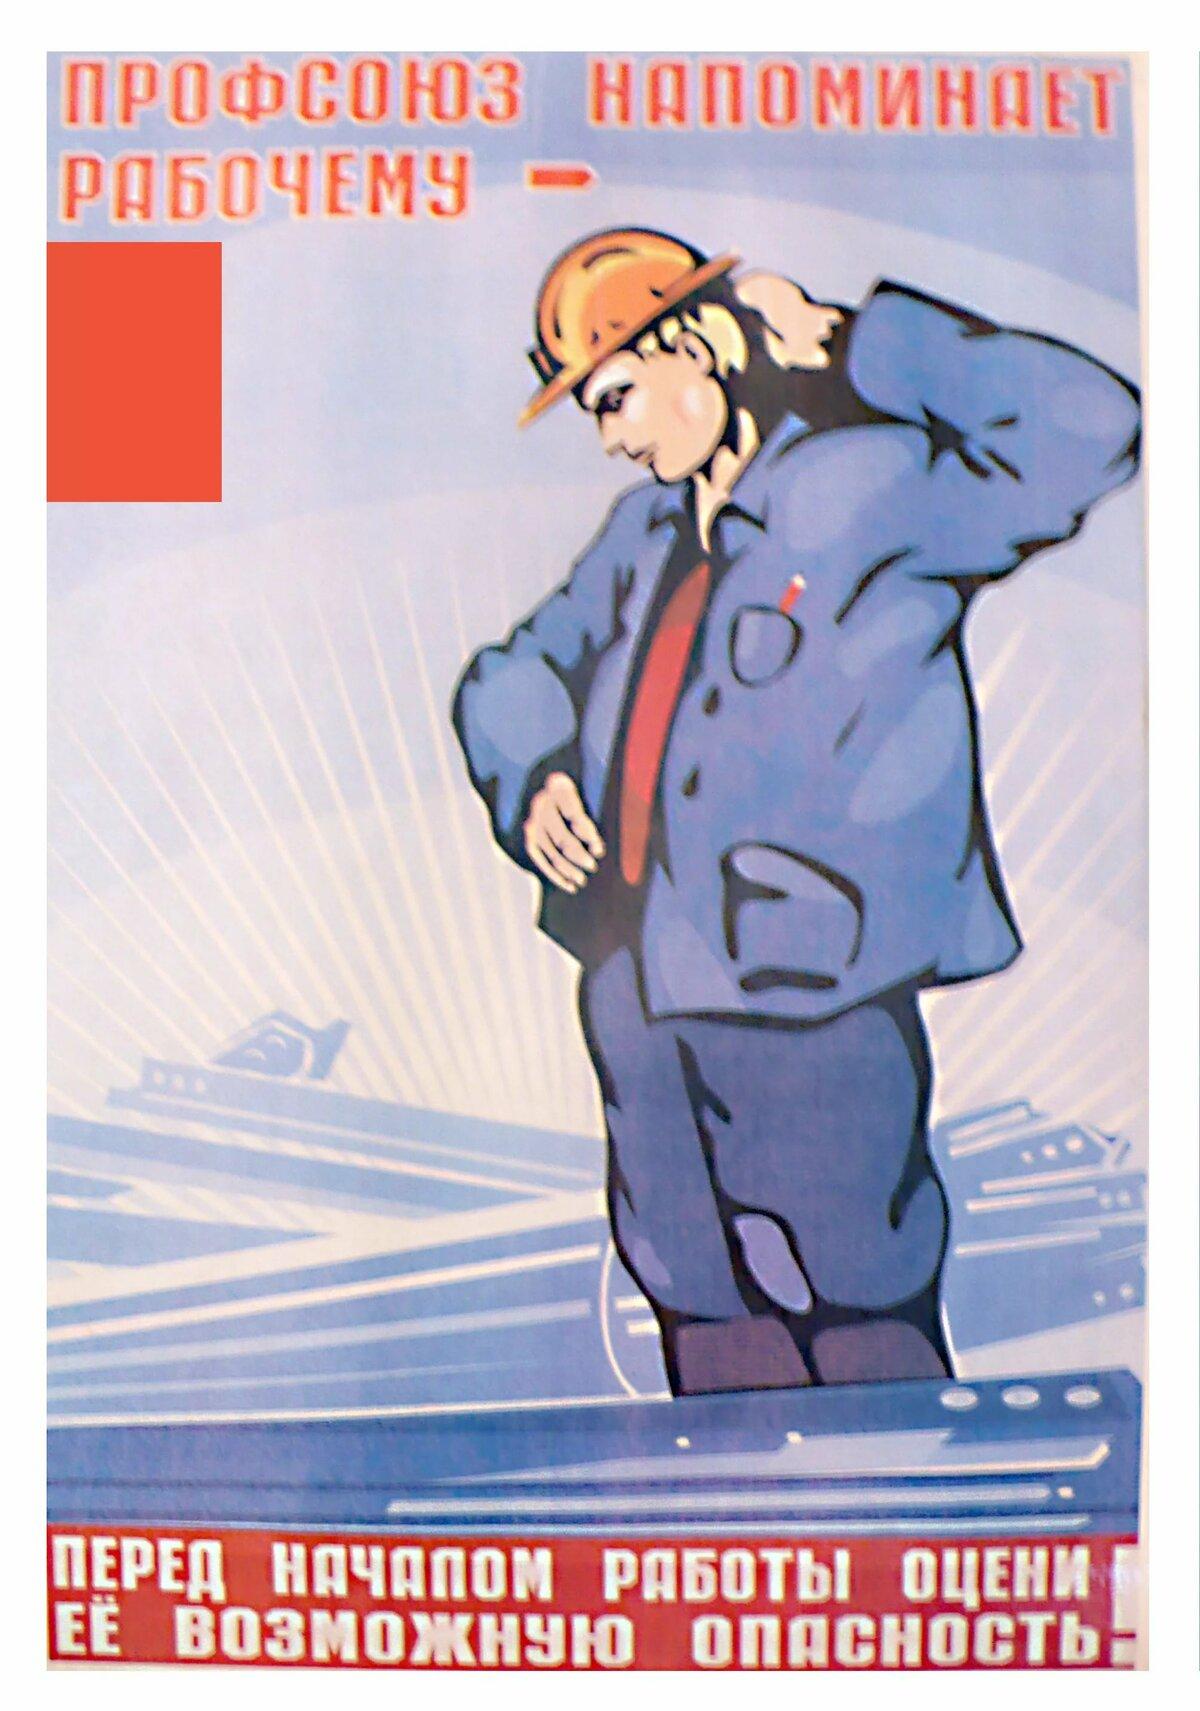 праздник труда картинки плакат популярным материалом